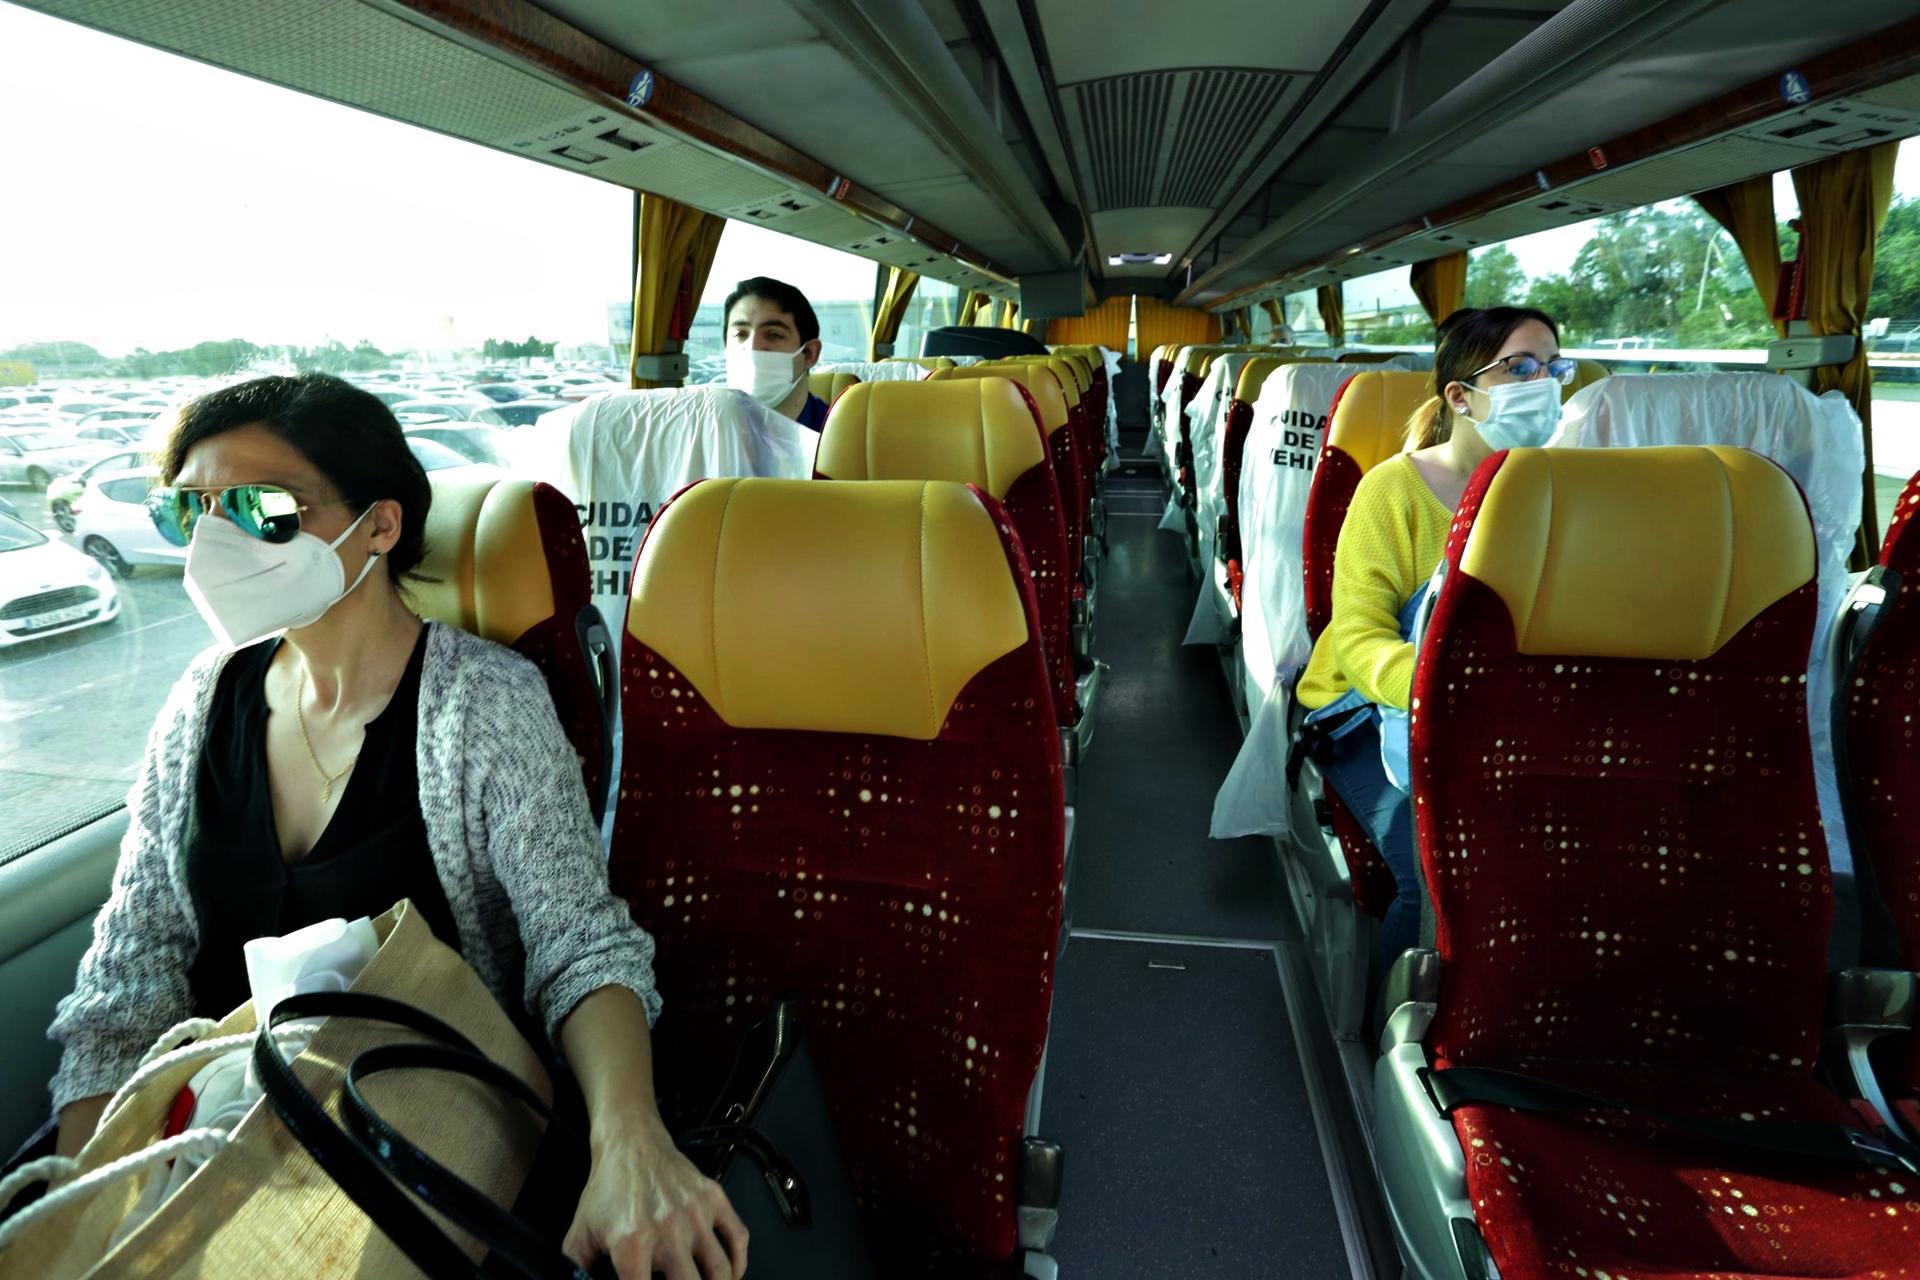 Mascarillas Coronavirus Autobus Ford